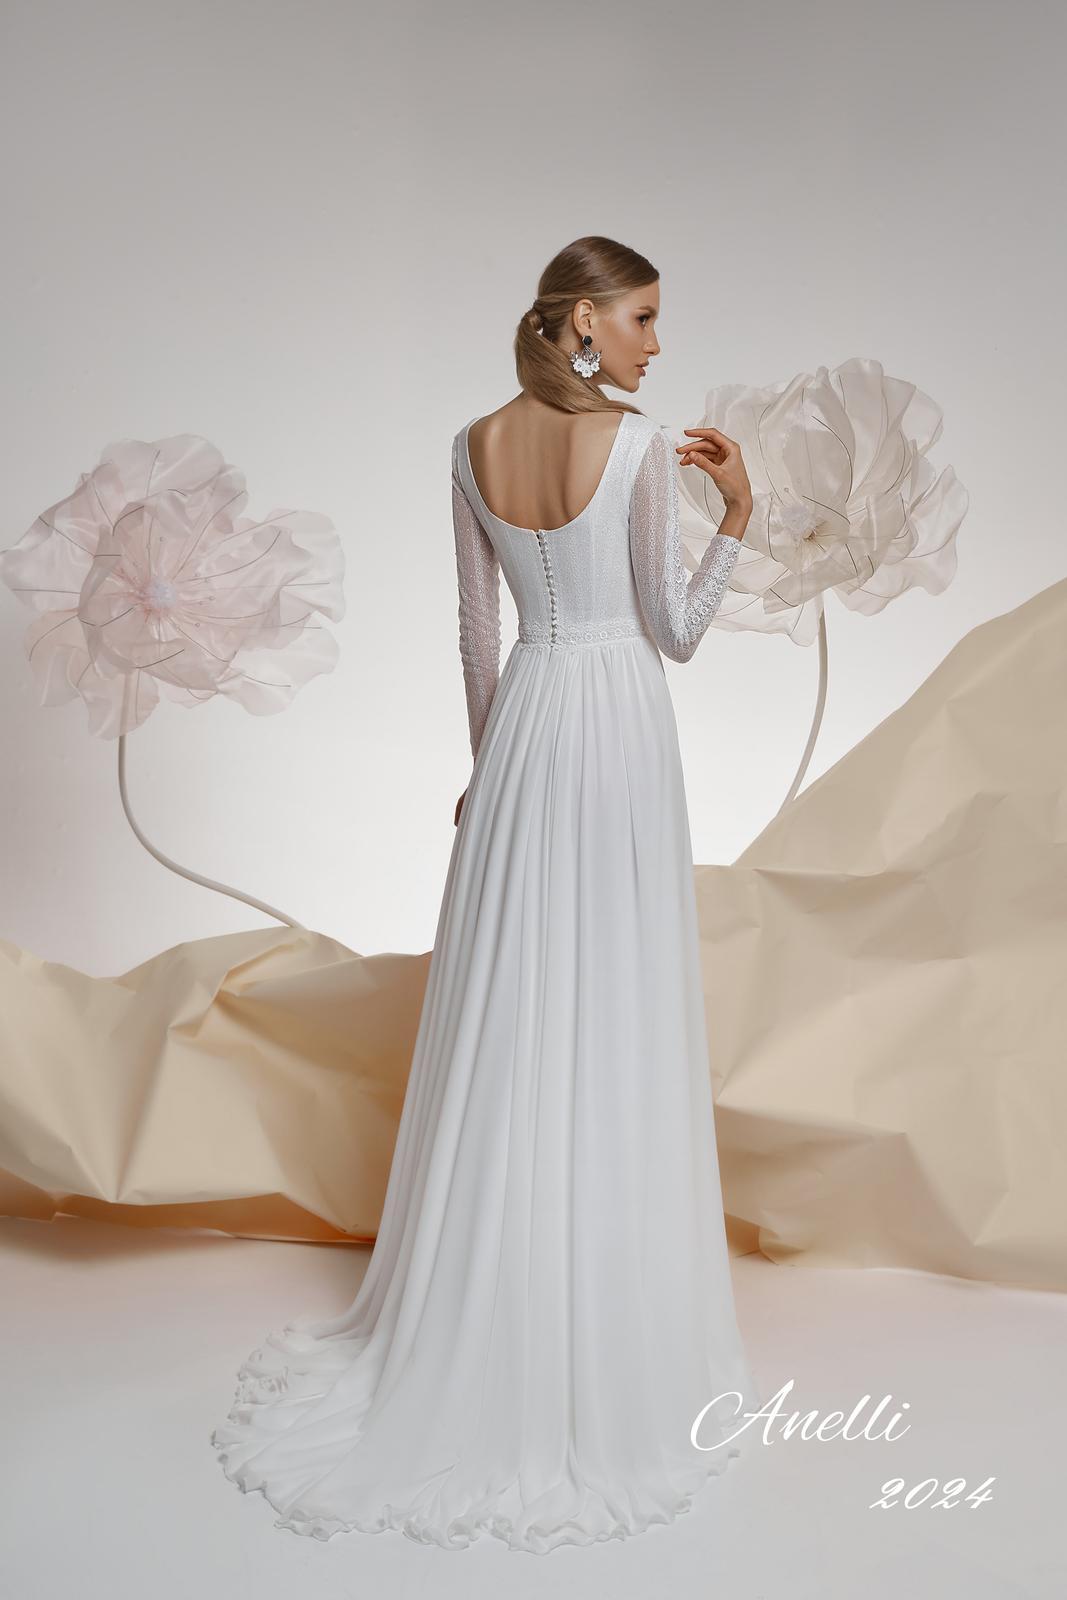 Svadobné šaty - Imagine 2024 - Obrázok č. 3